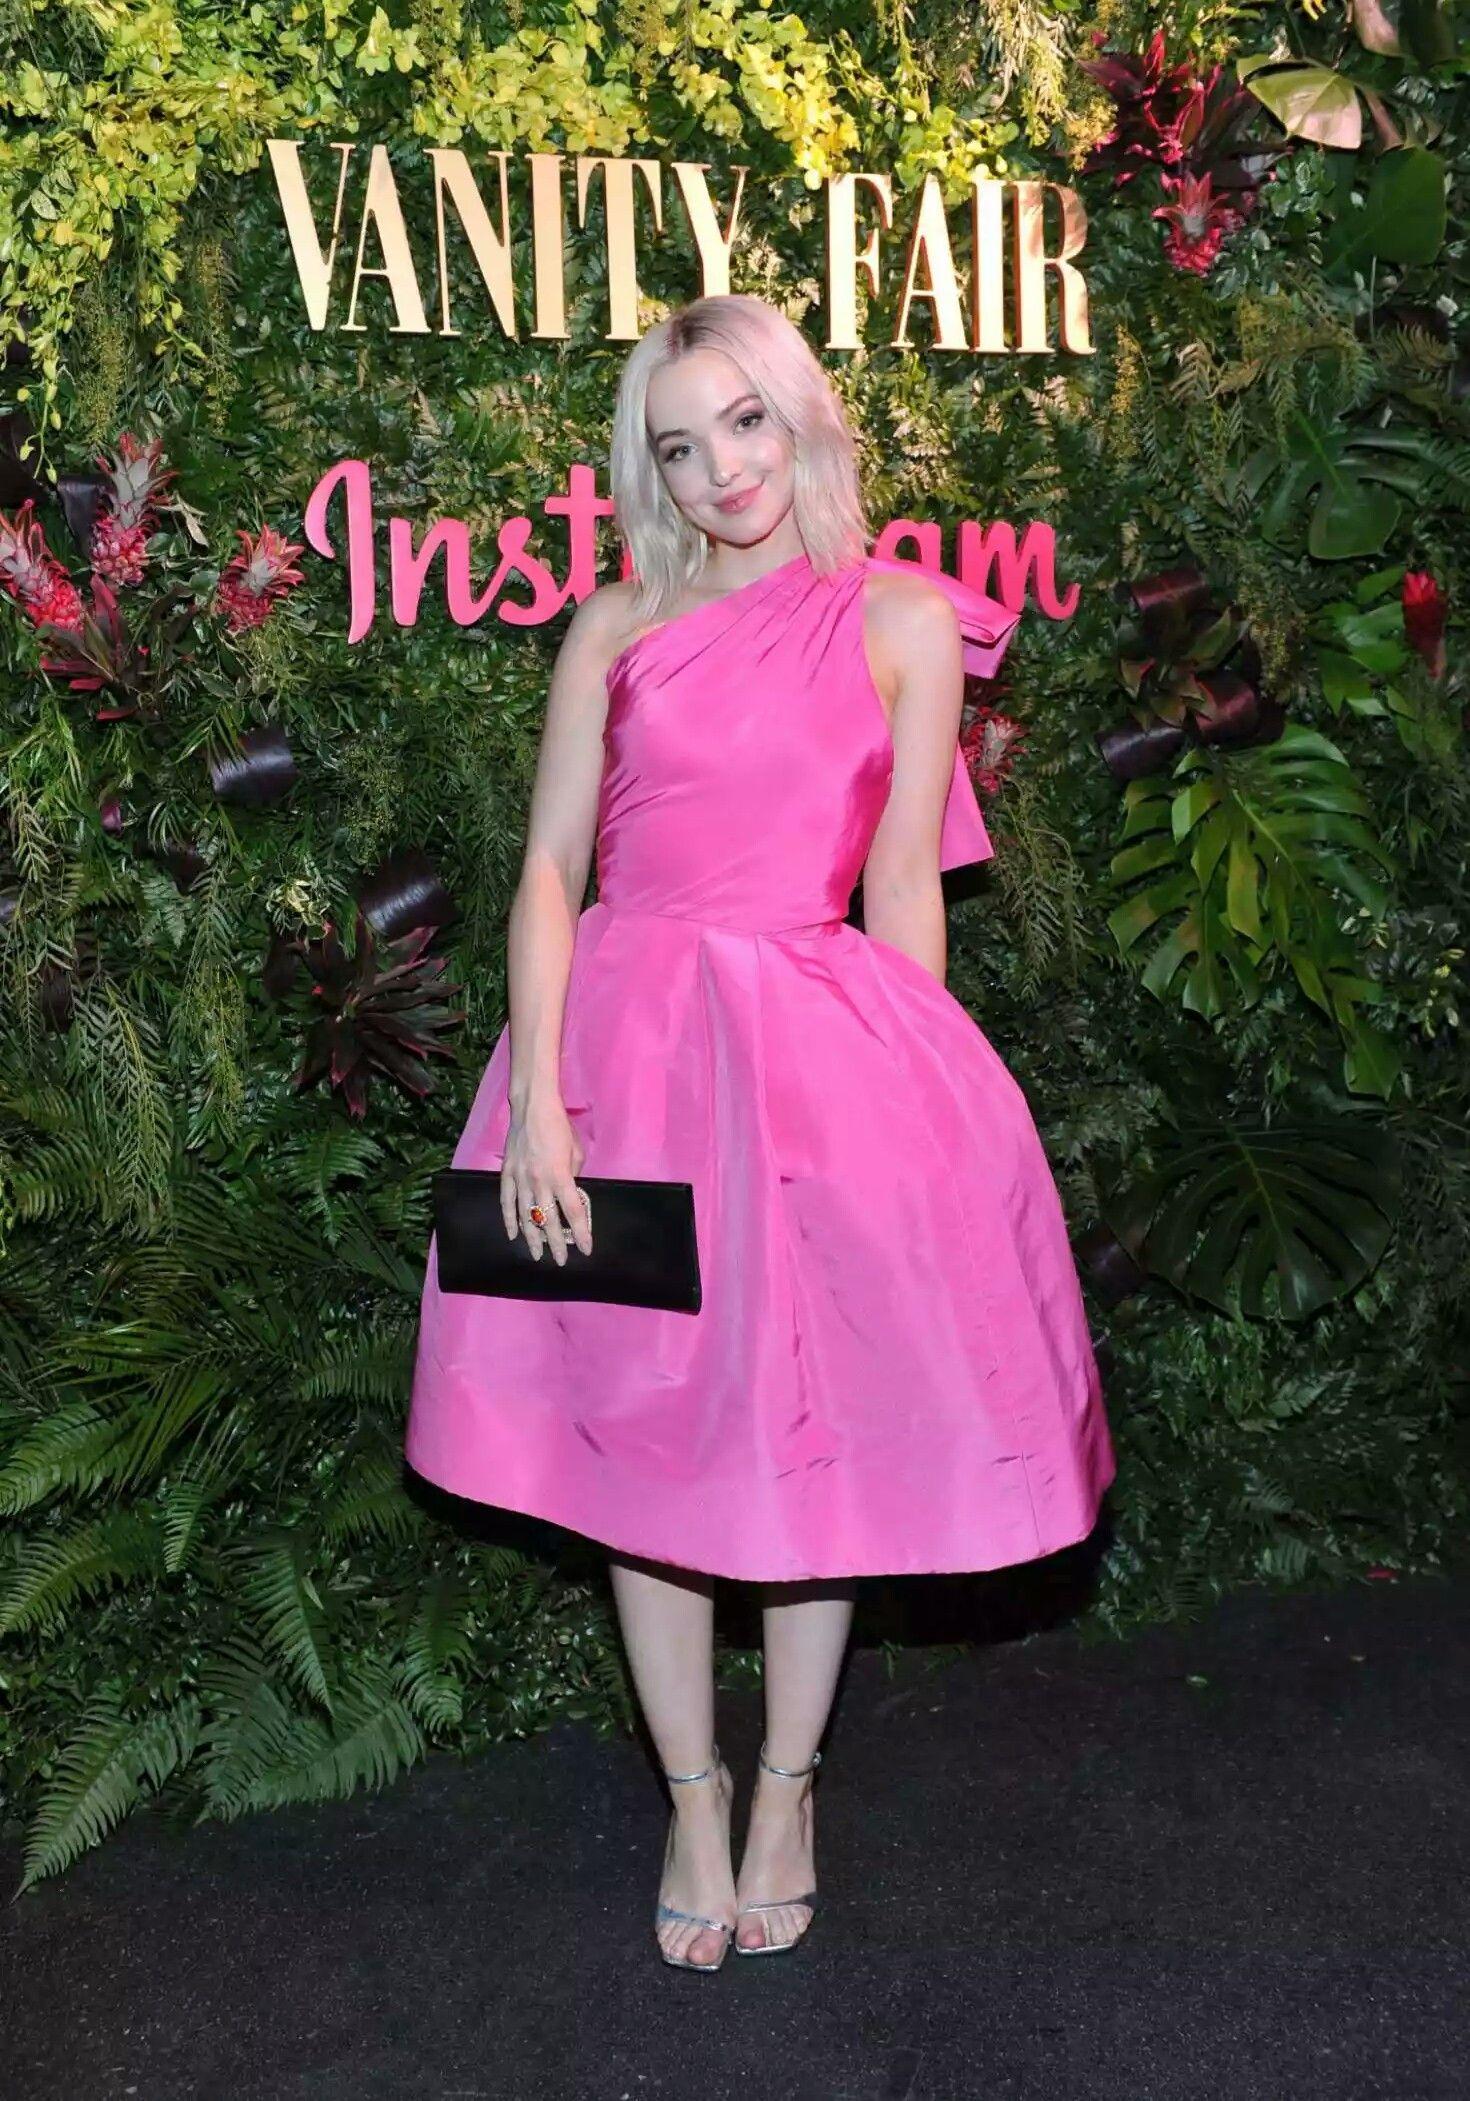 Cameron Pink Dove Dress